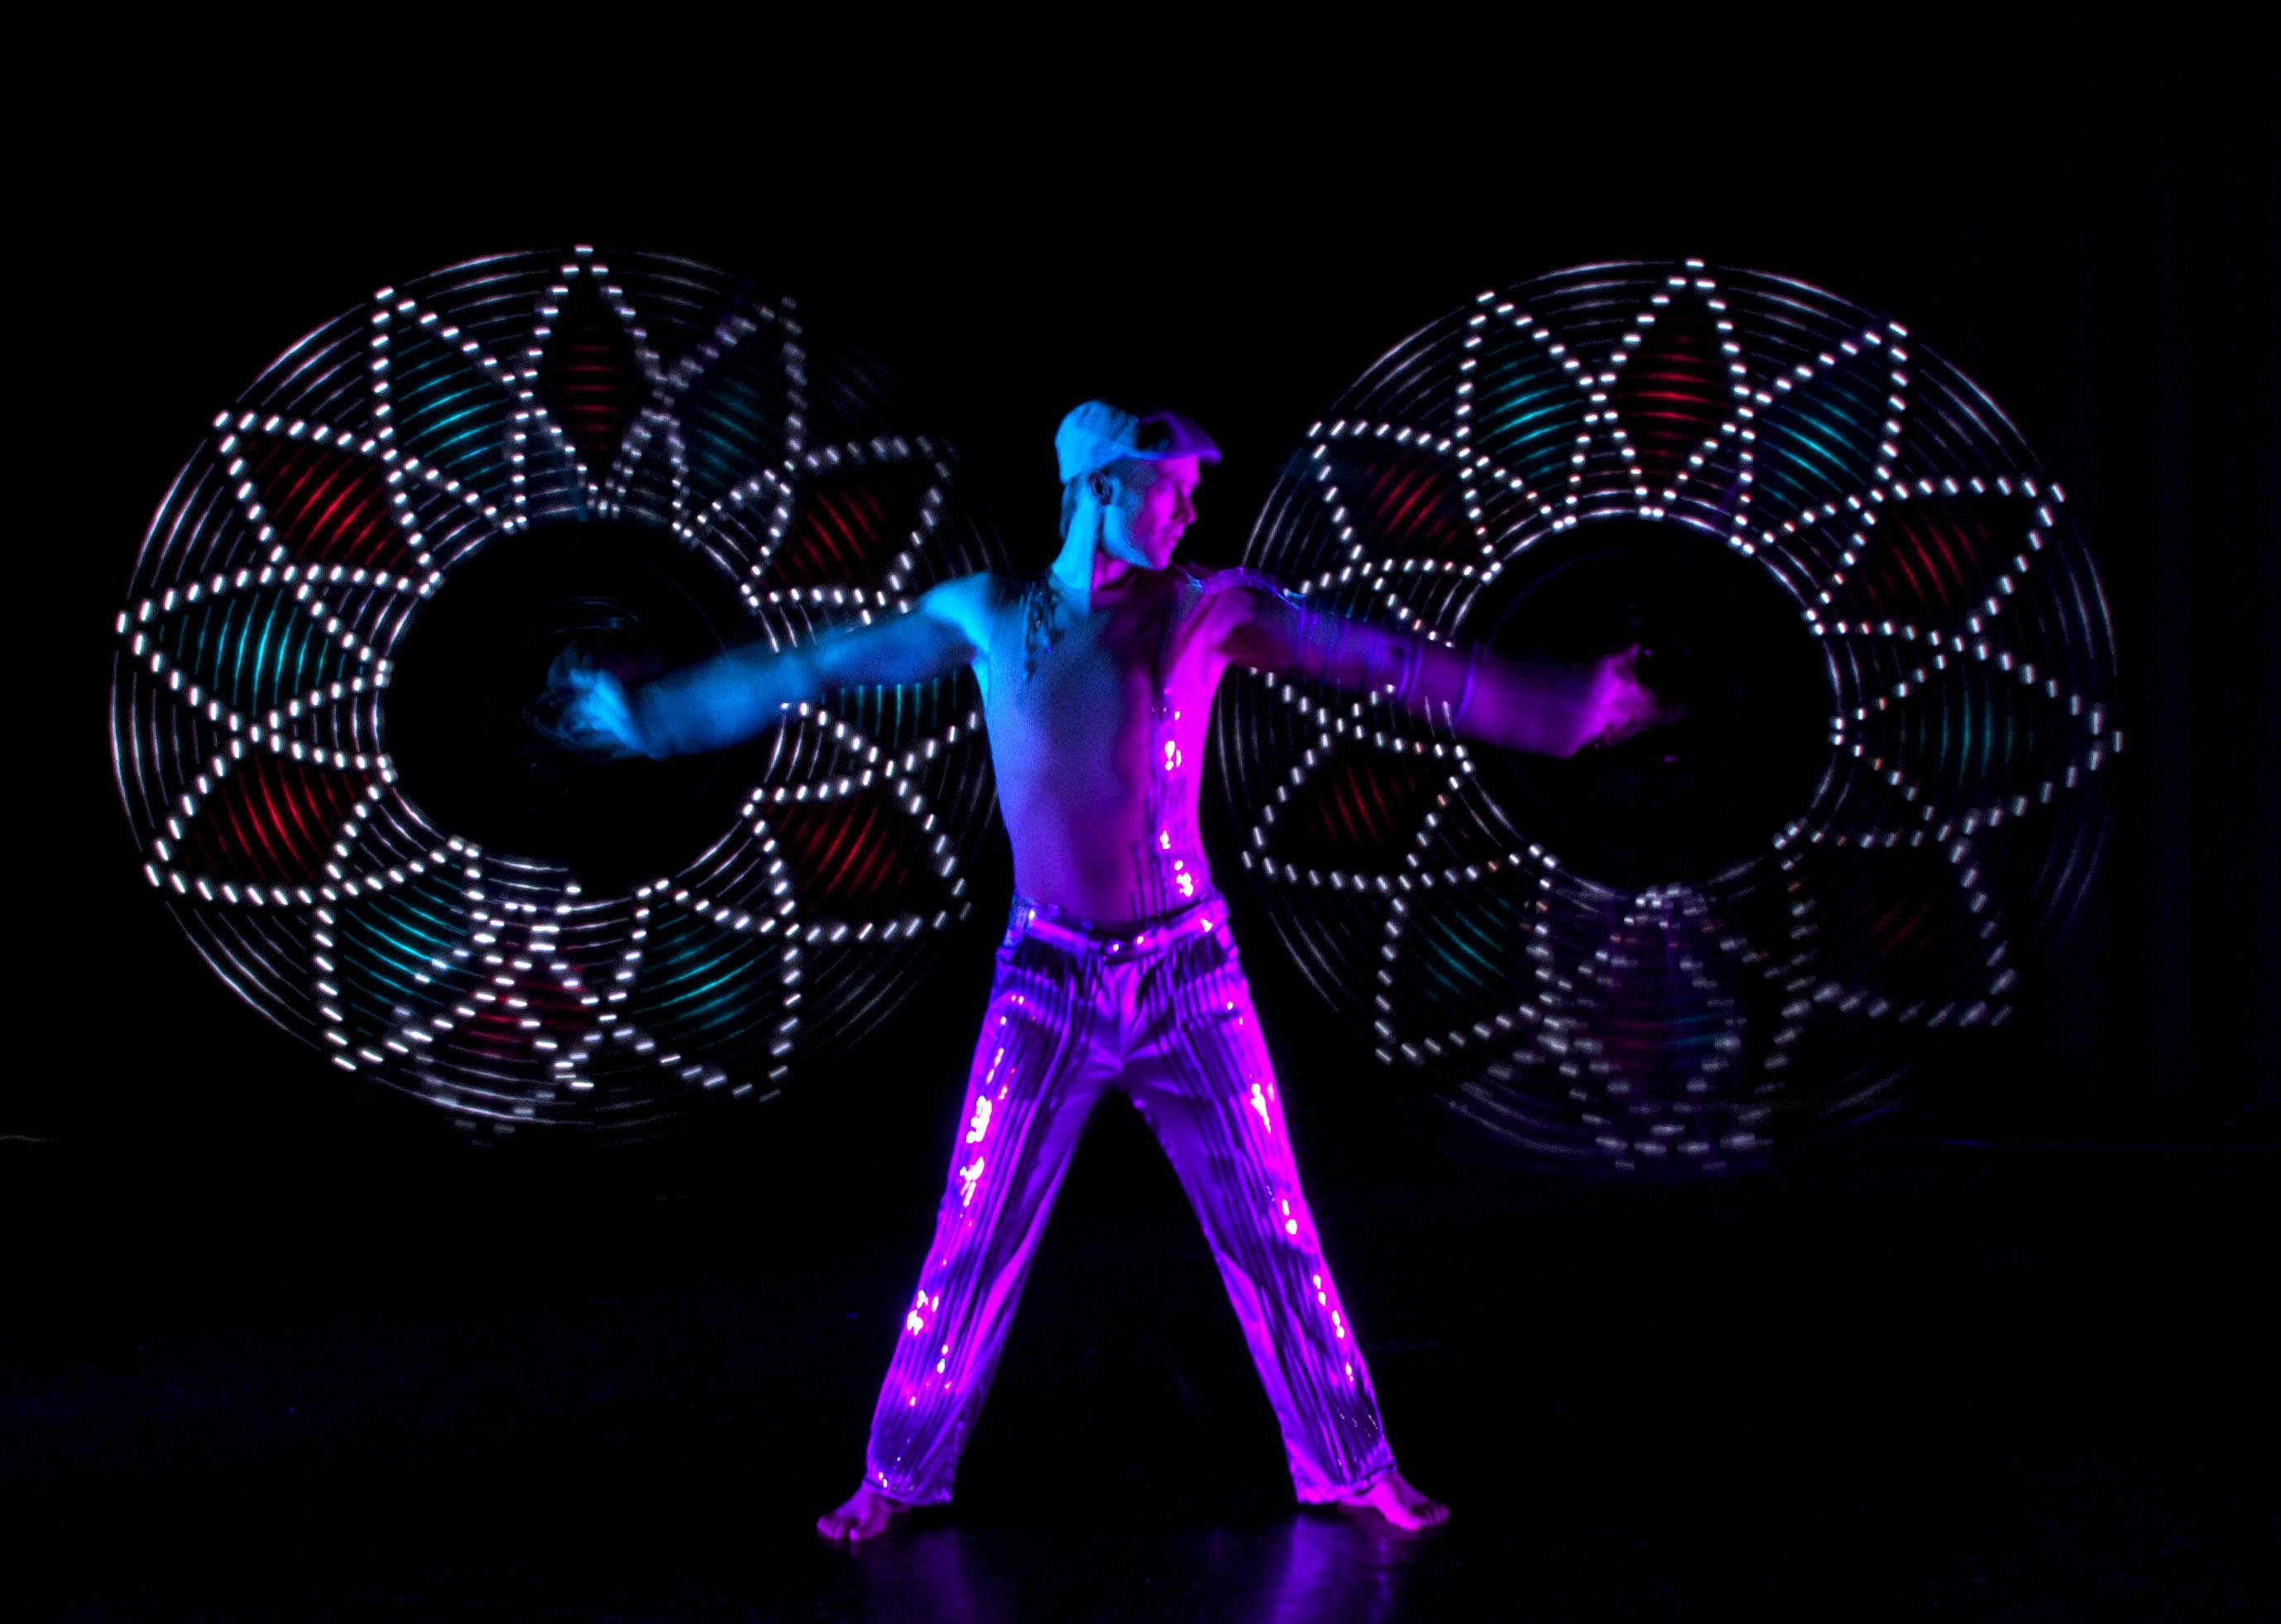 Spinning-Poi-Light-Show